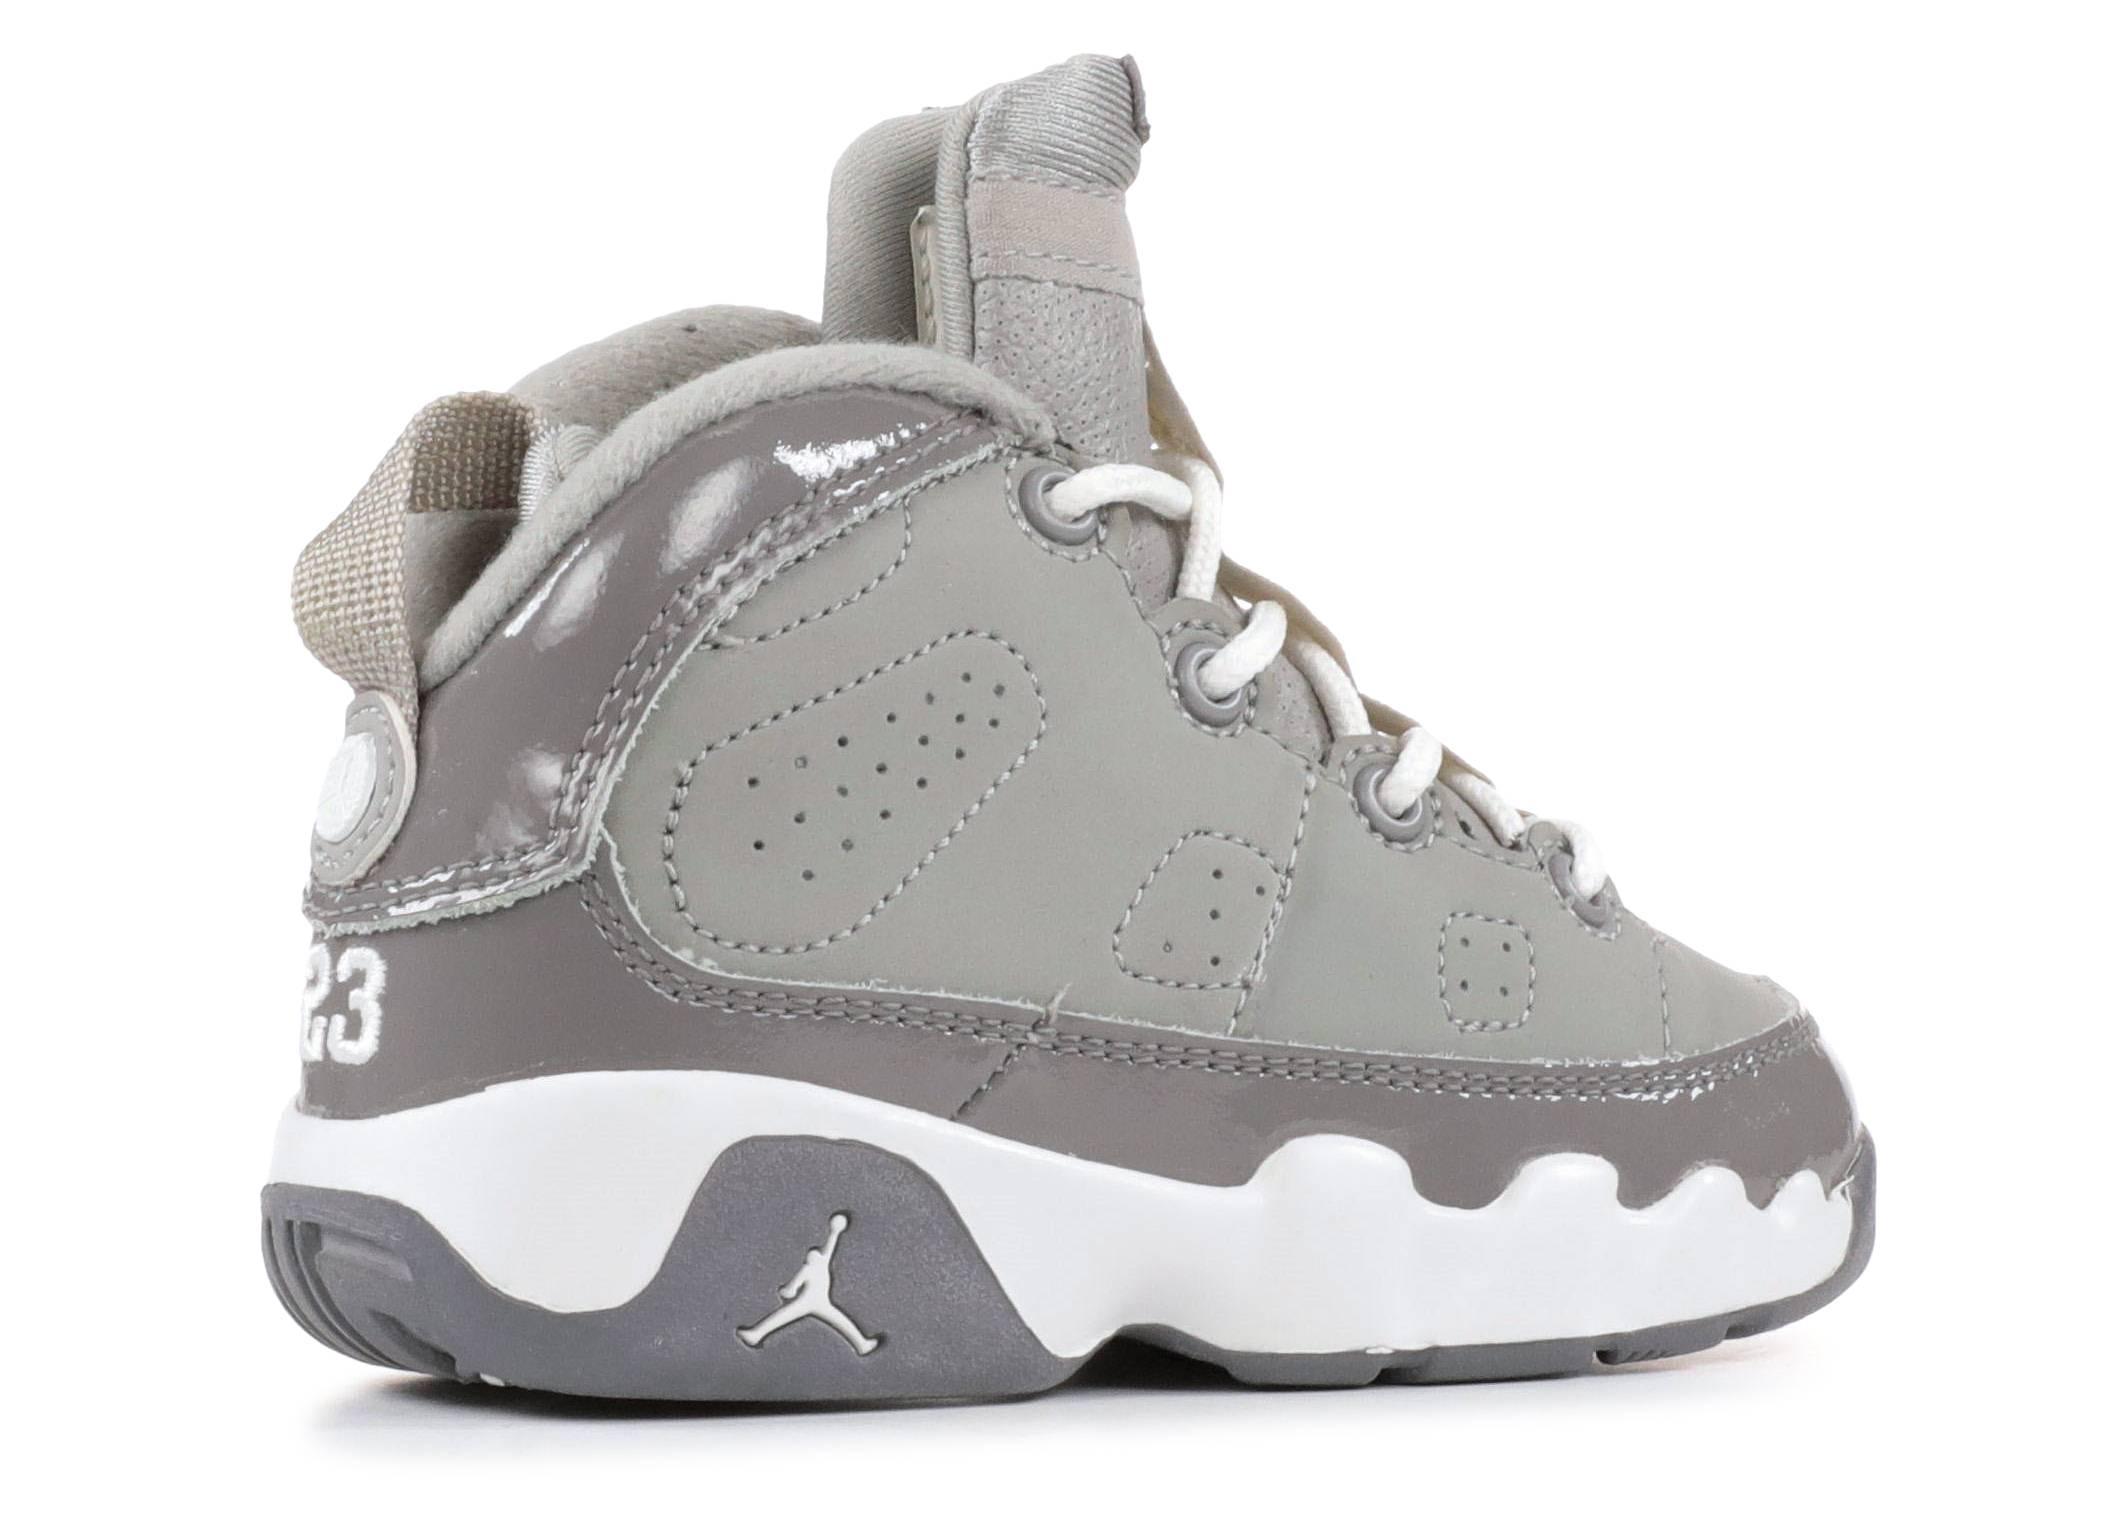 a5ff96fbe14f Baby Jordan 9 Retro Infant - Air Jordan - 302354 011 - medium grey white-cool  grey